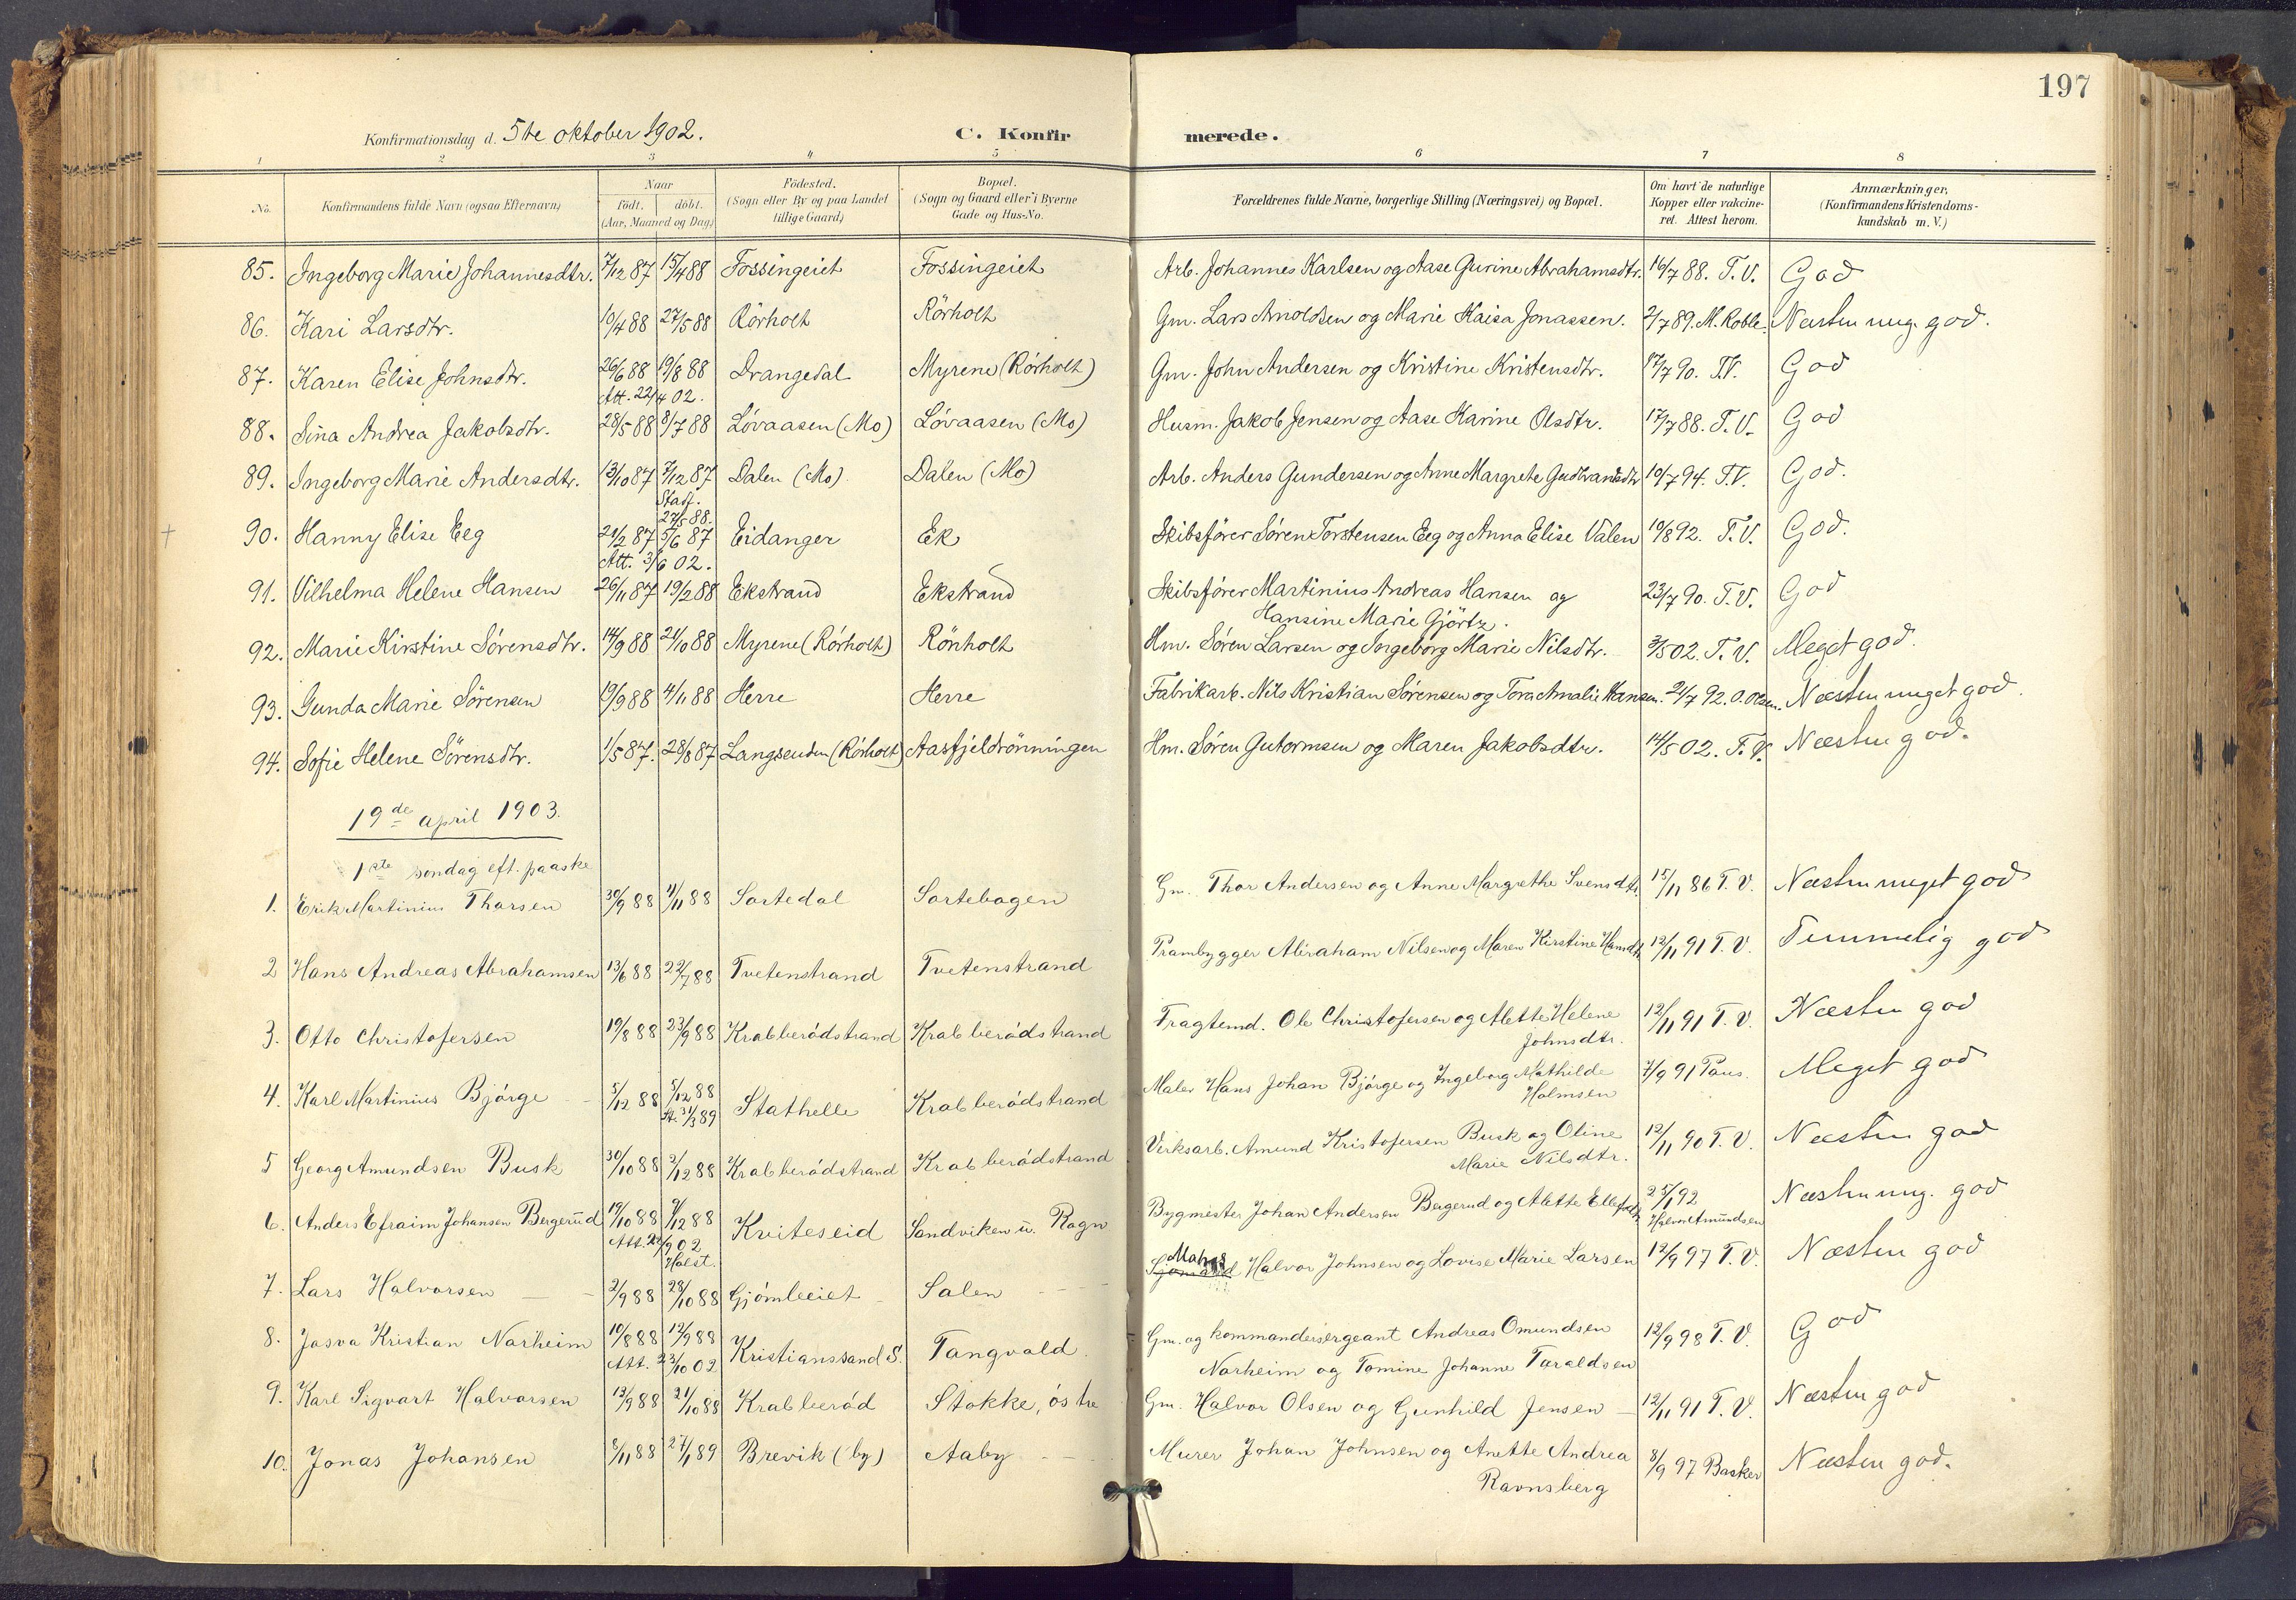 SAKO, Bamble kirkebøker, F/Fa/L0009: Ministerialbok nr. I 9, 1901-1917, s. 197